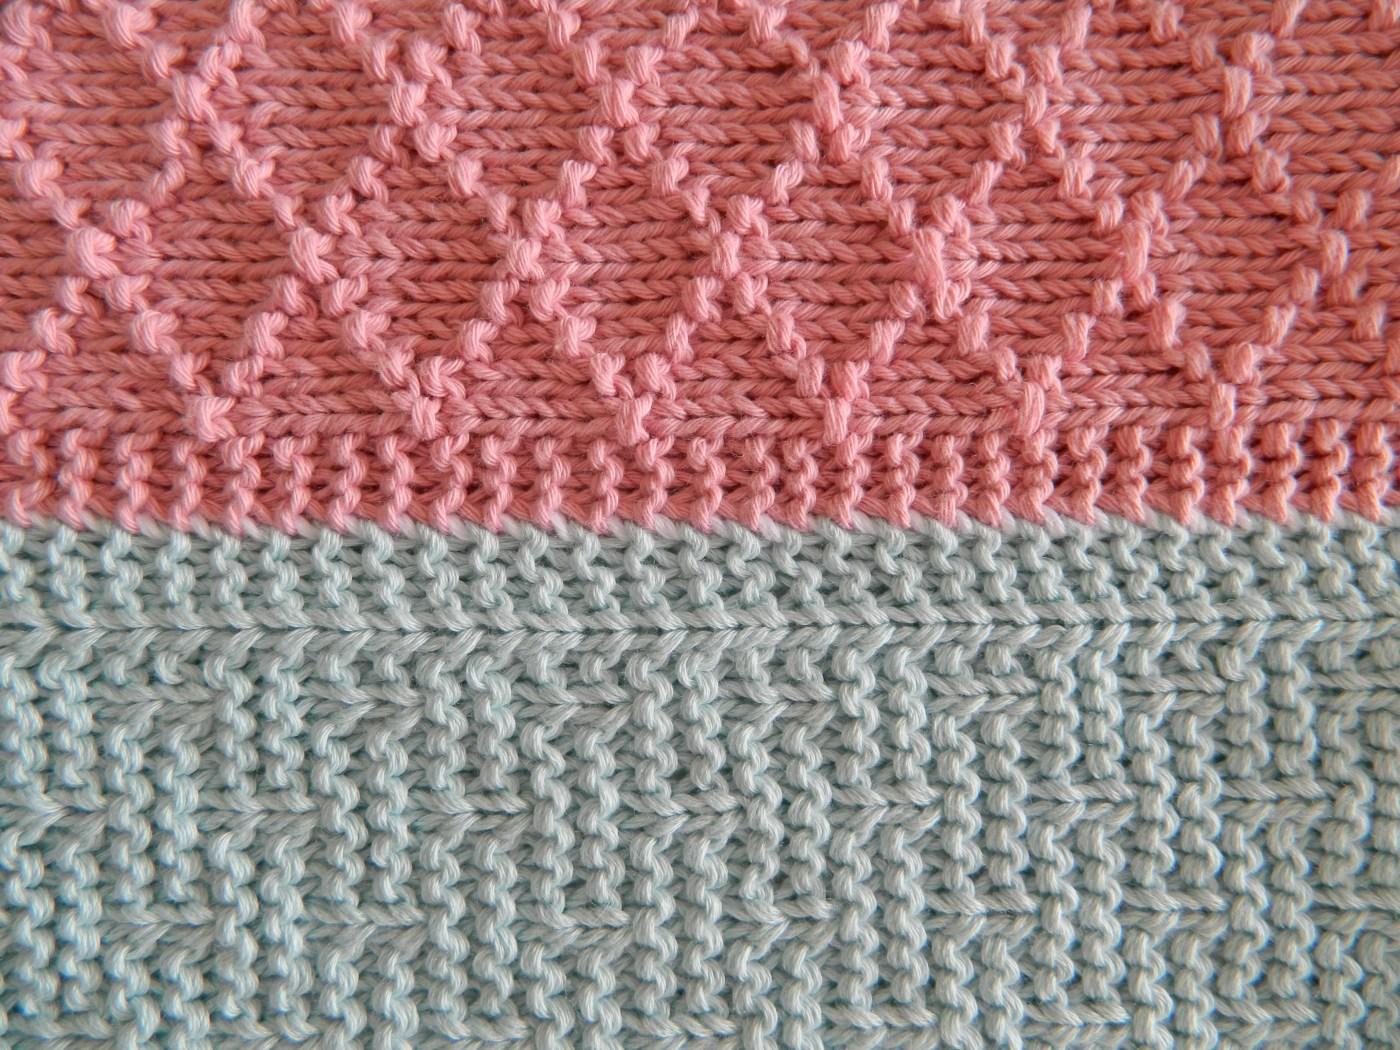 vertical seam knitting edge to edge